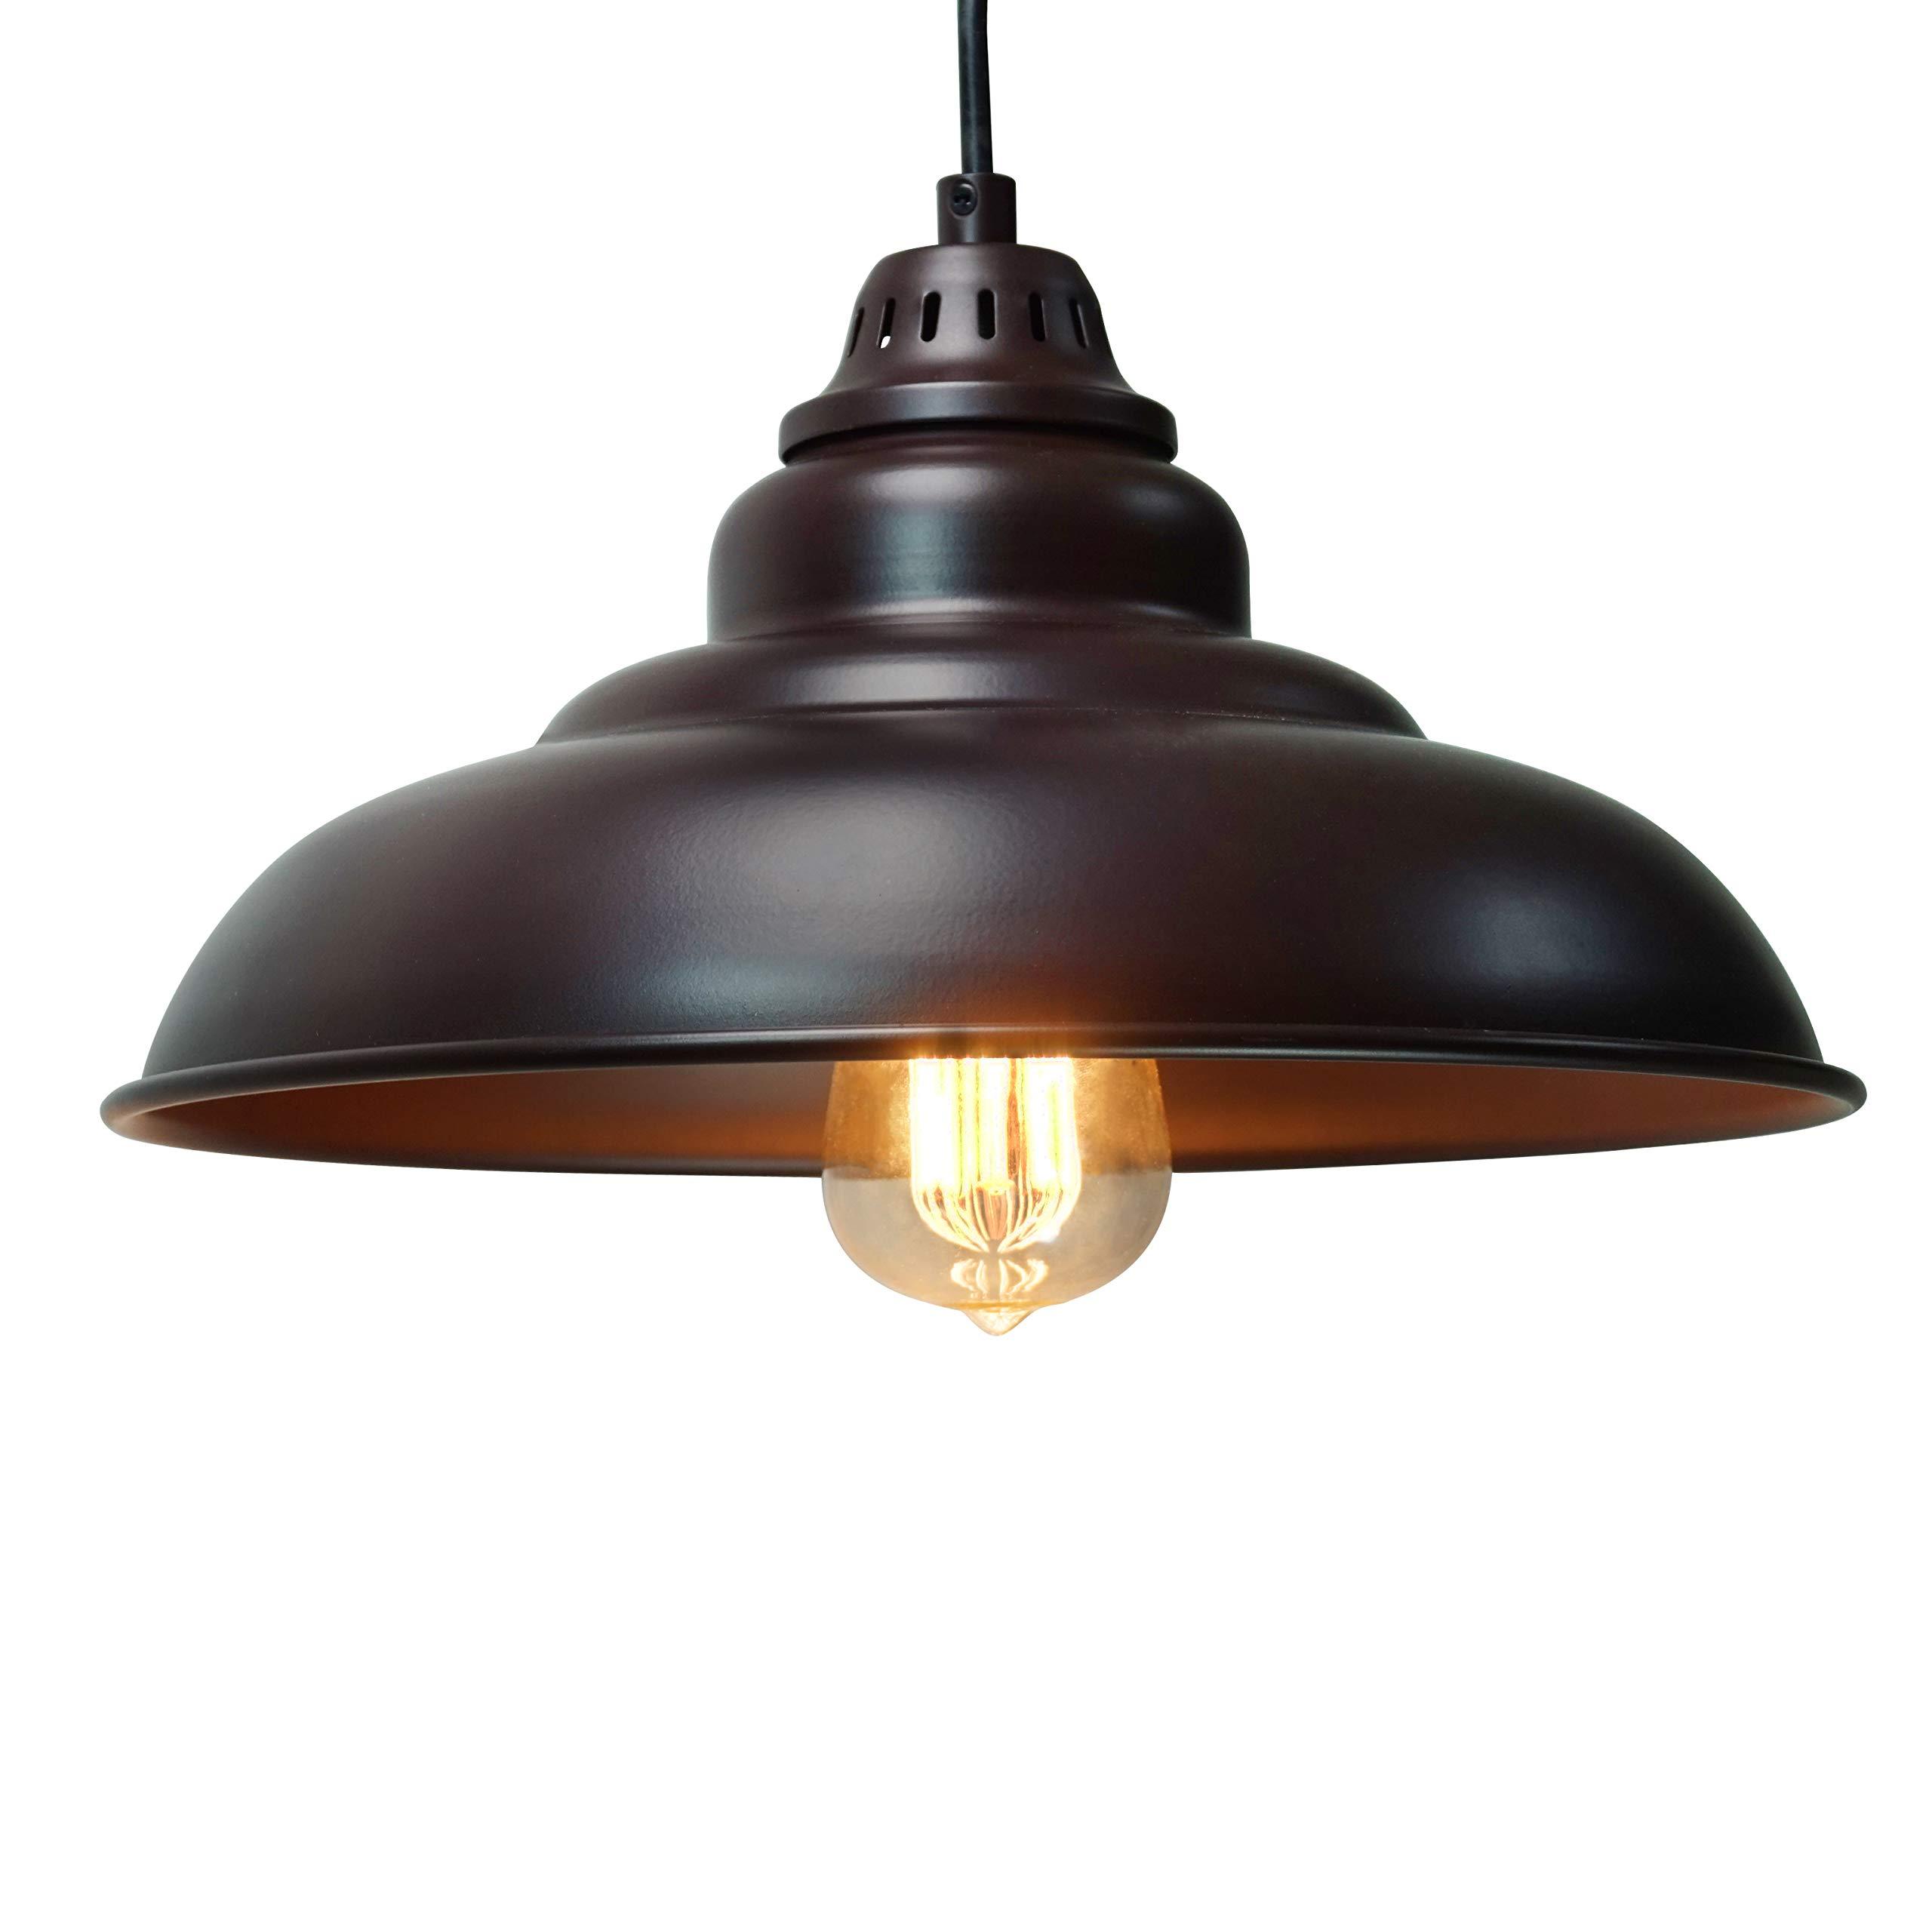 Barn Pendant Lights, FINXIN 1-Light Hanging Light for Kitchen Dining Table FXPL01 Oil-Rubbed Bronze 12'' Ceiling Dome Pendant Lighting E26 Base (Bronze)